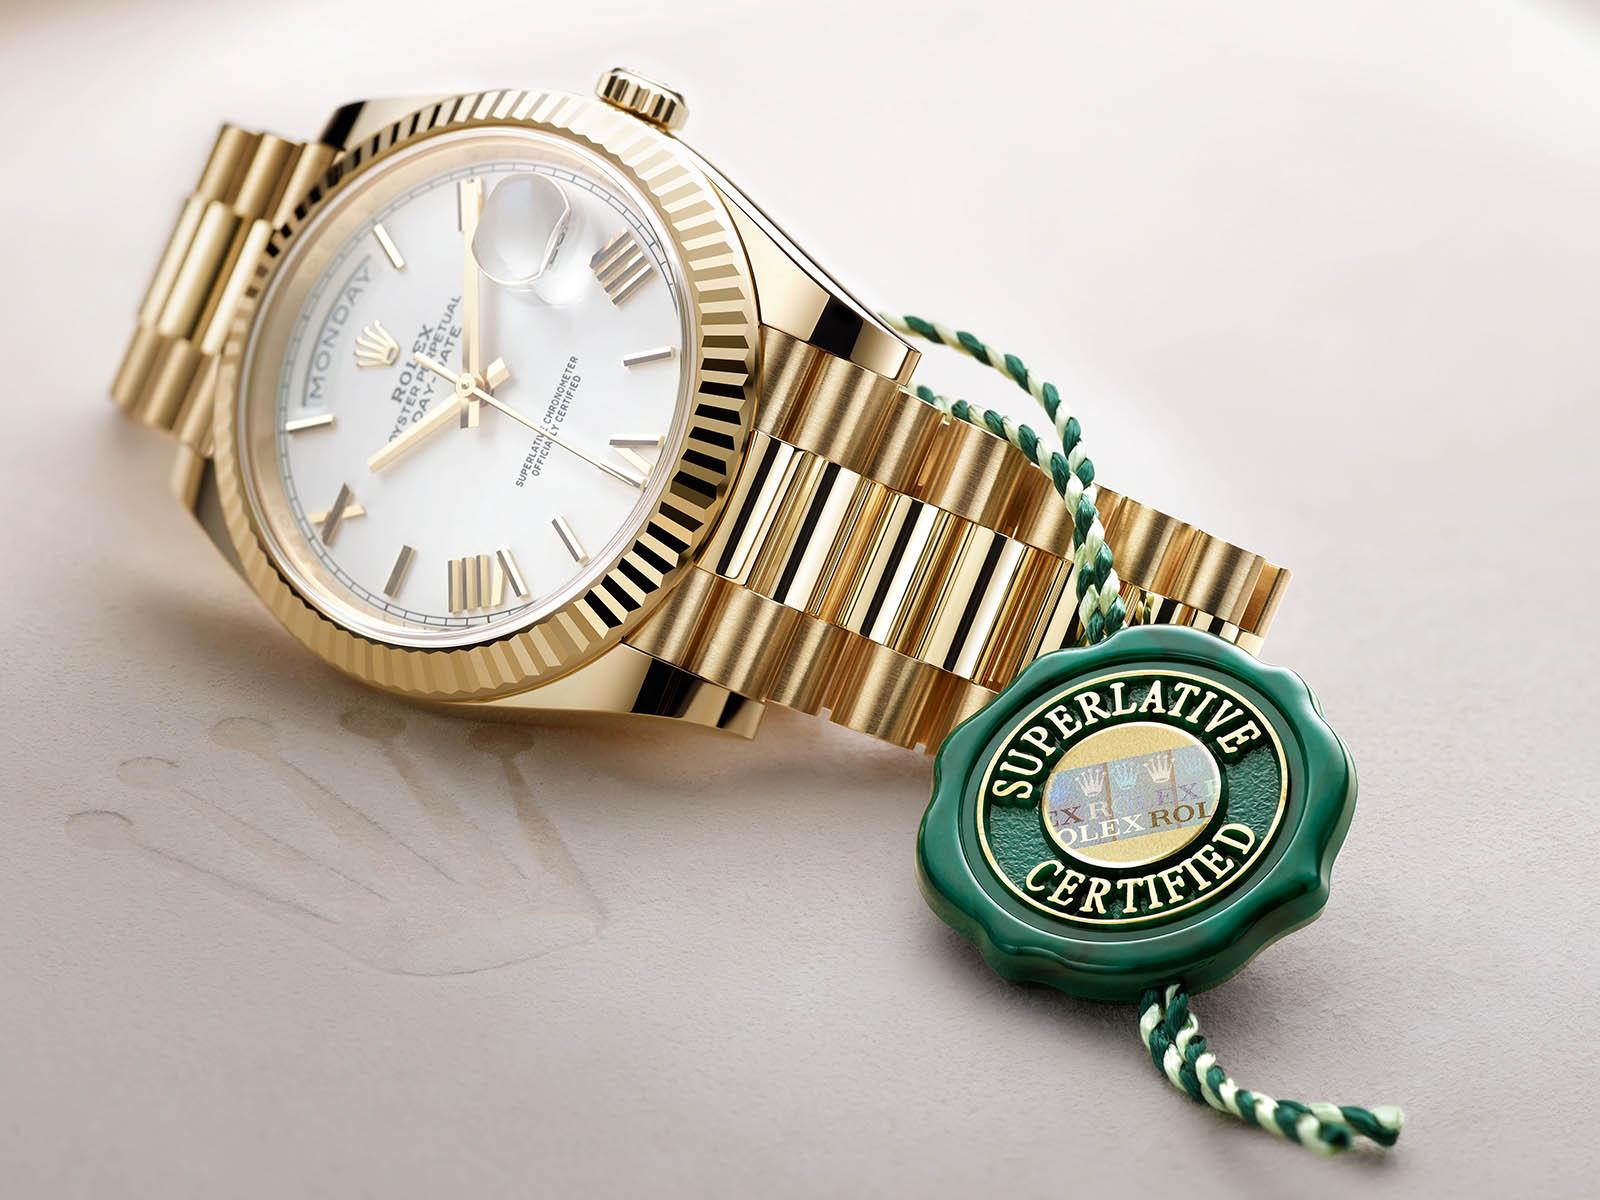 rolex-bracelets-and-straps-1.jpg